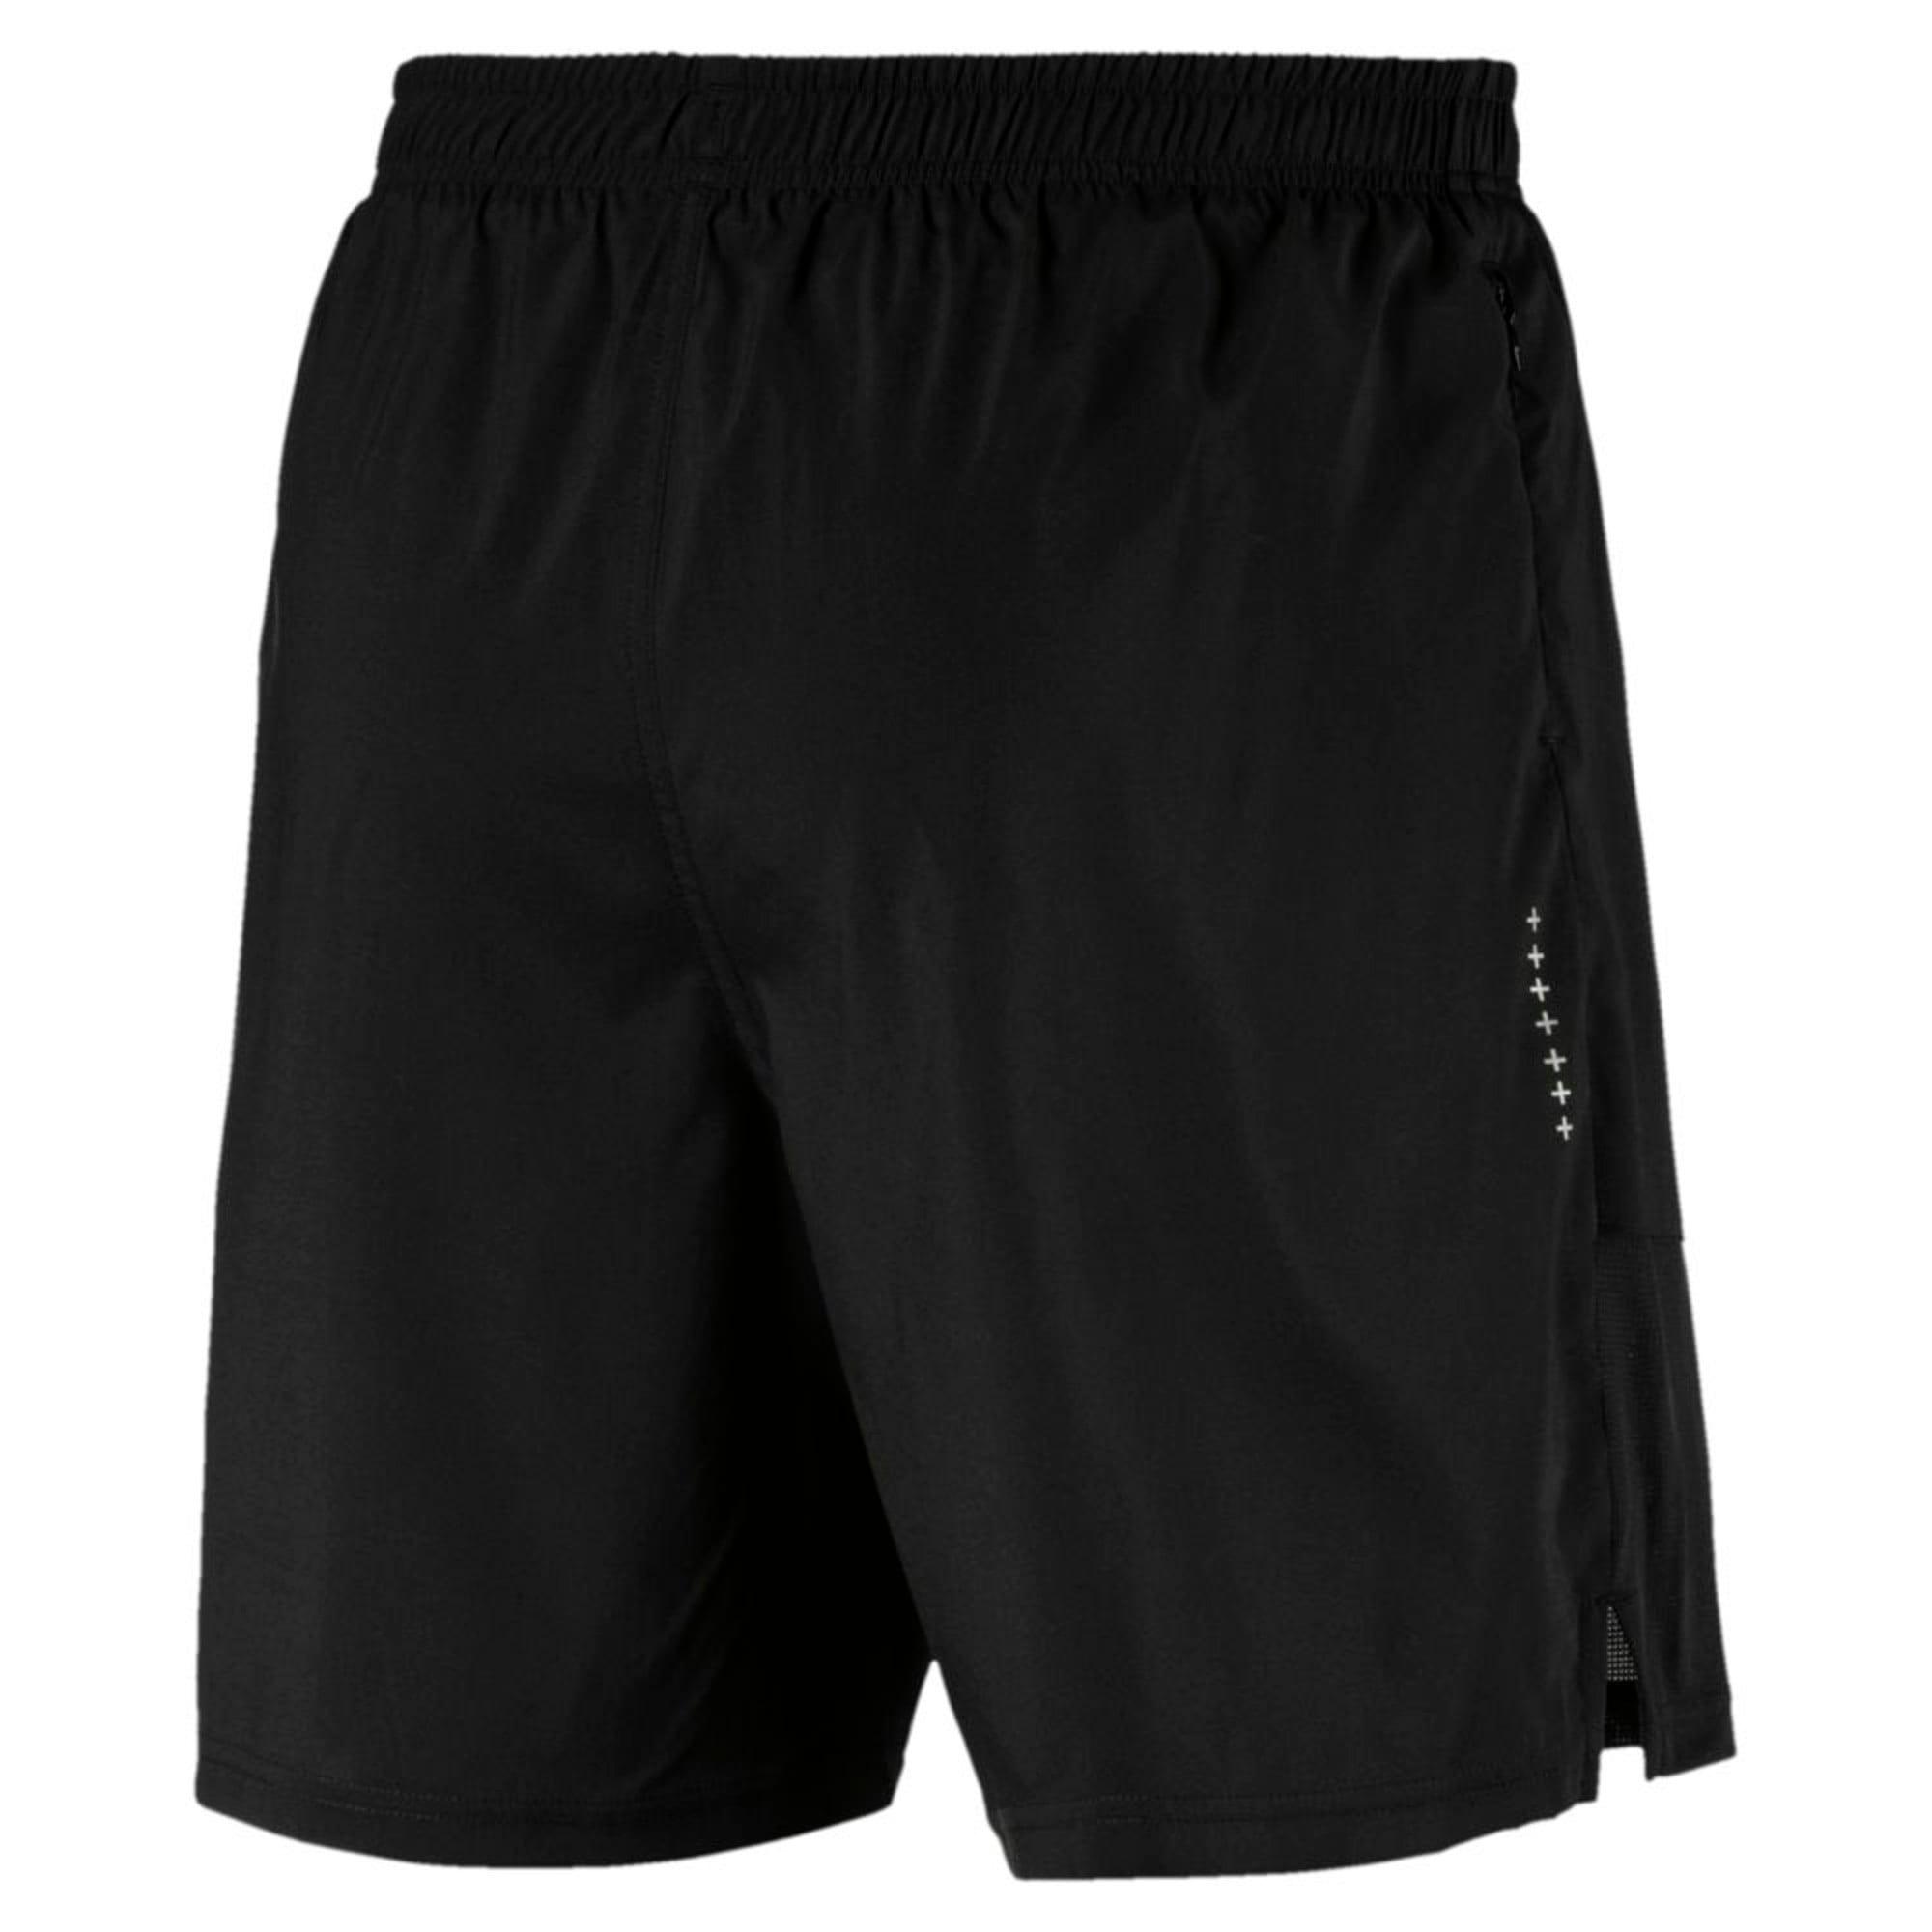 "Thumbnail 2 of Ignite 7"" Men's Running Shorts, Puma Black, medium-IND"